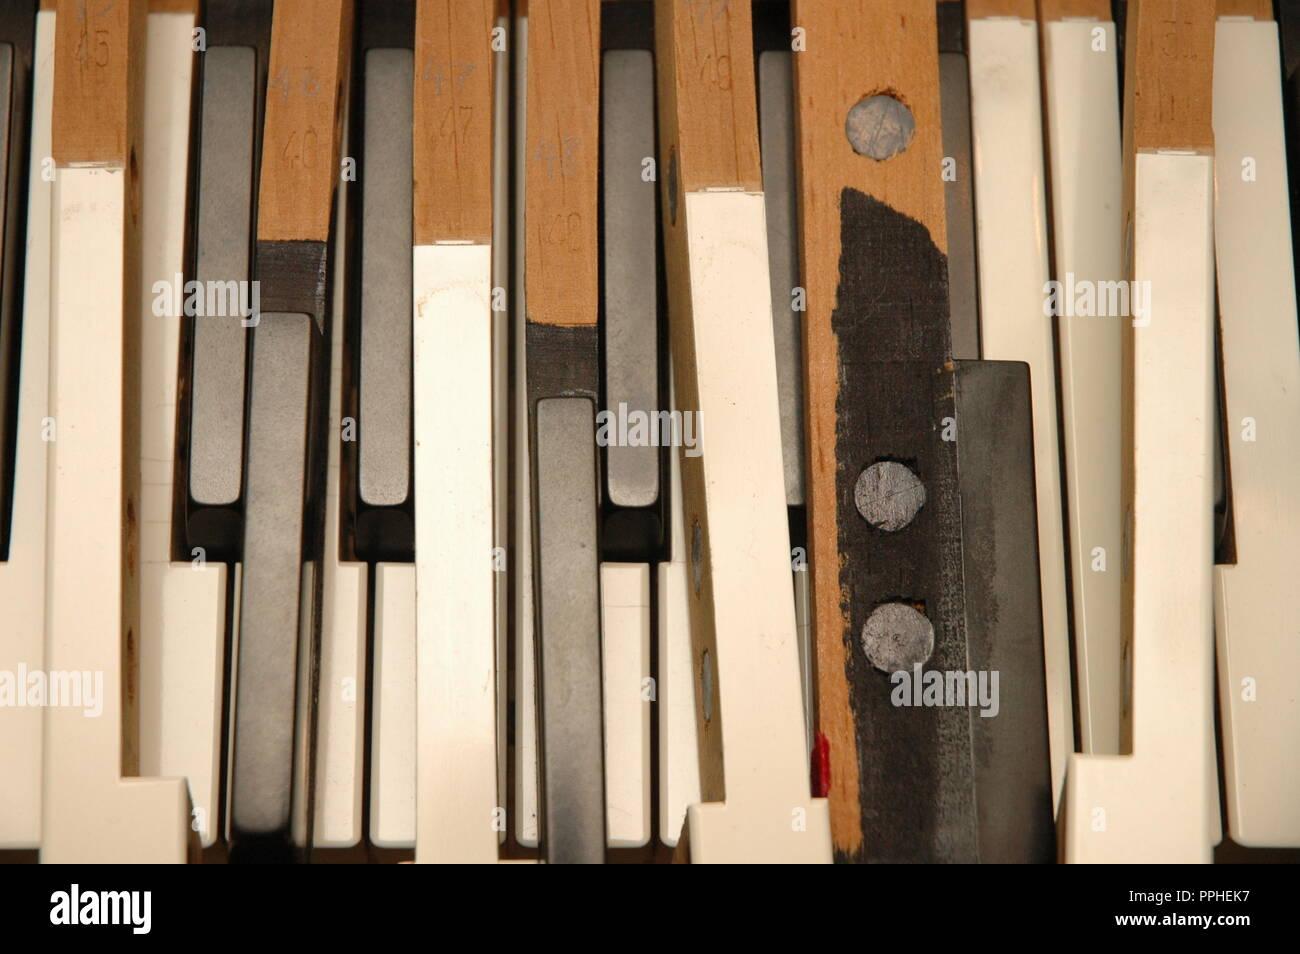 Disassembled Piano Keys - Stock Image